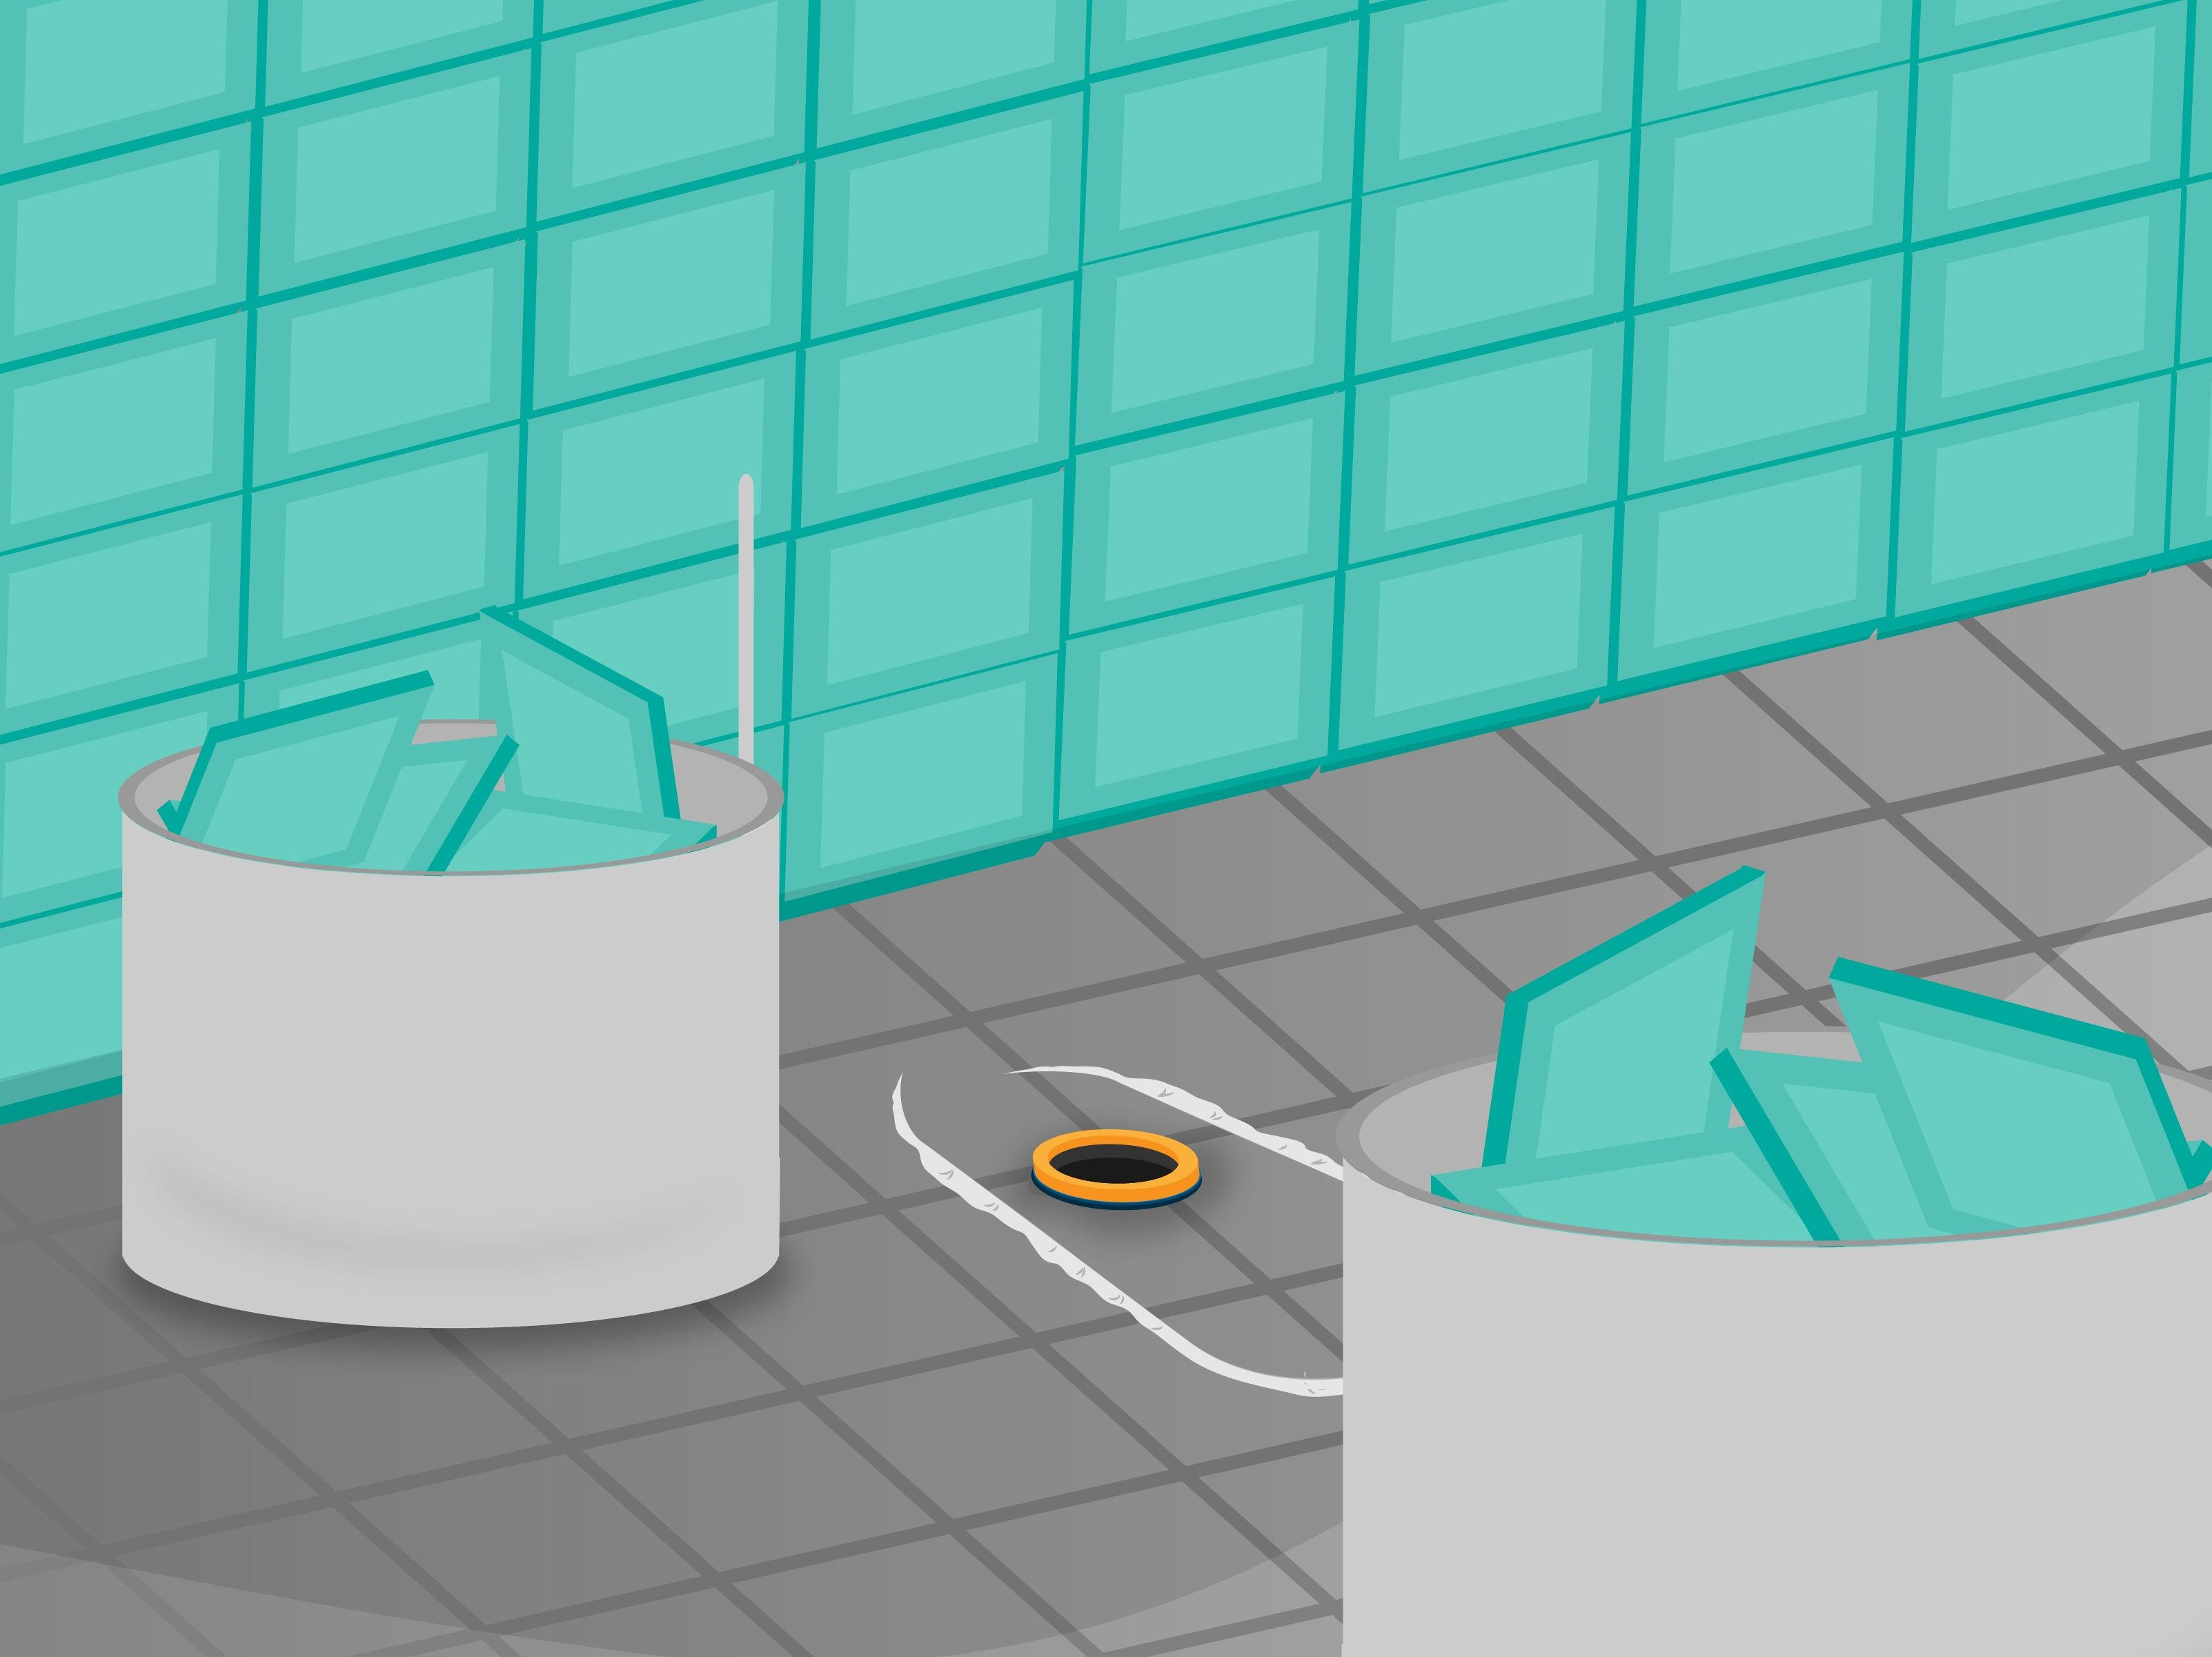 Remove Bathroom Tile   Bathroom tiling, Bathroom fixtures and Drywall